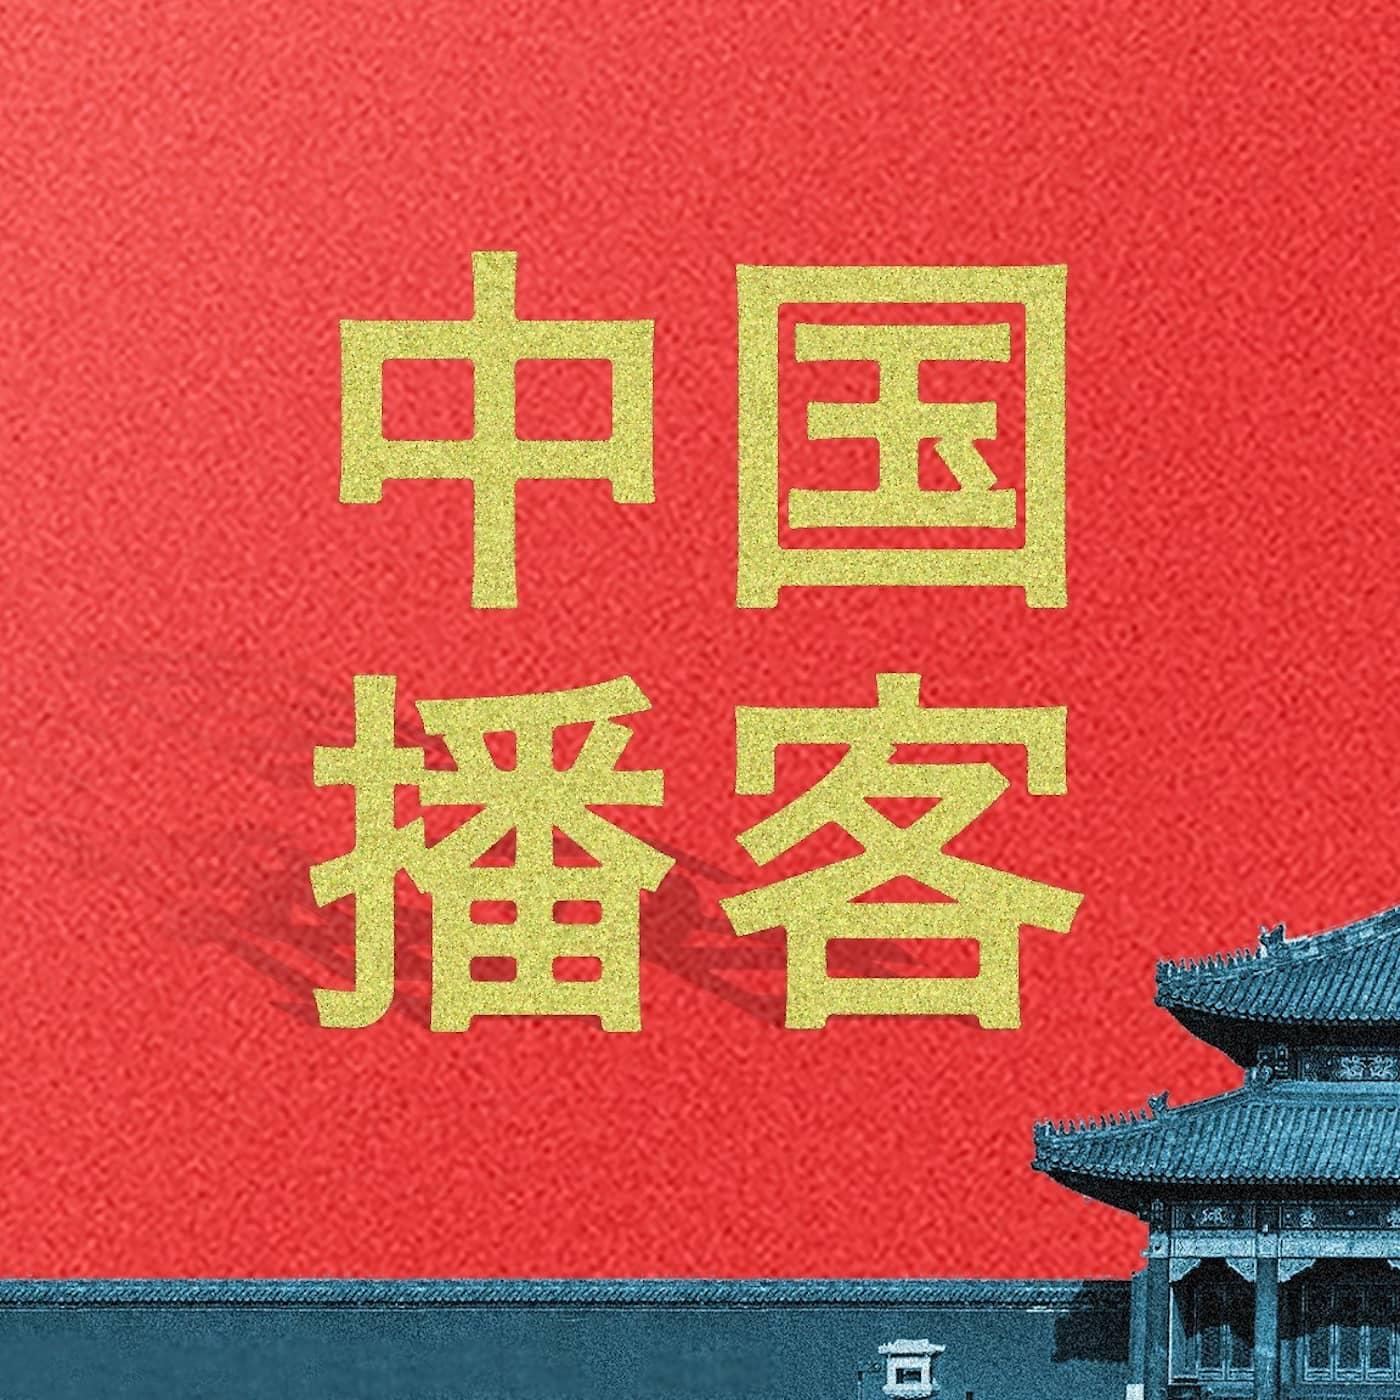 Idag Hongkong, imorgon Taiwan?